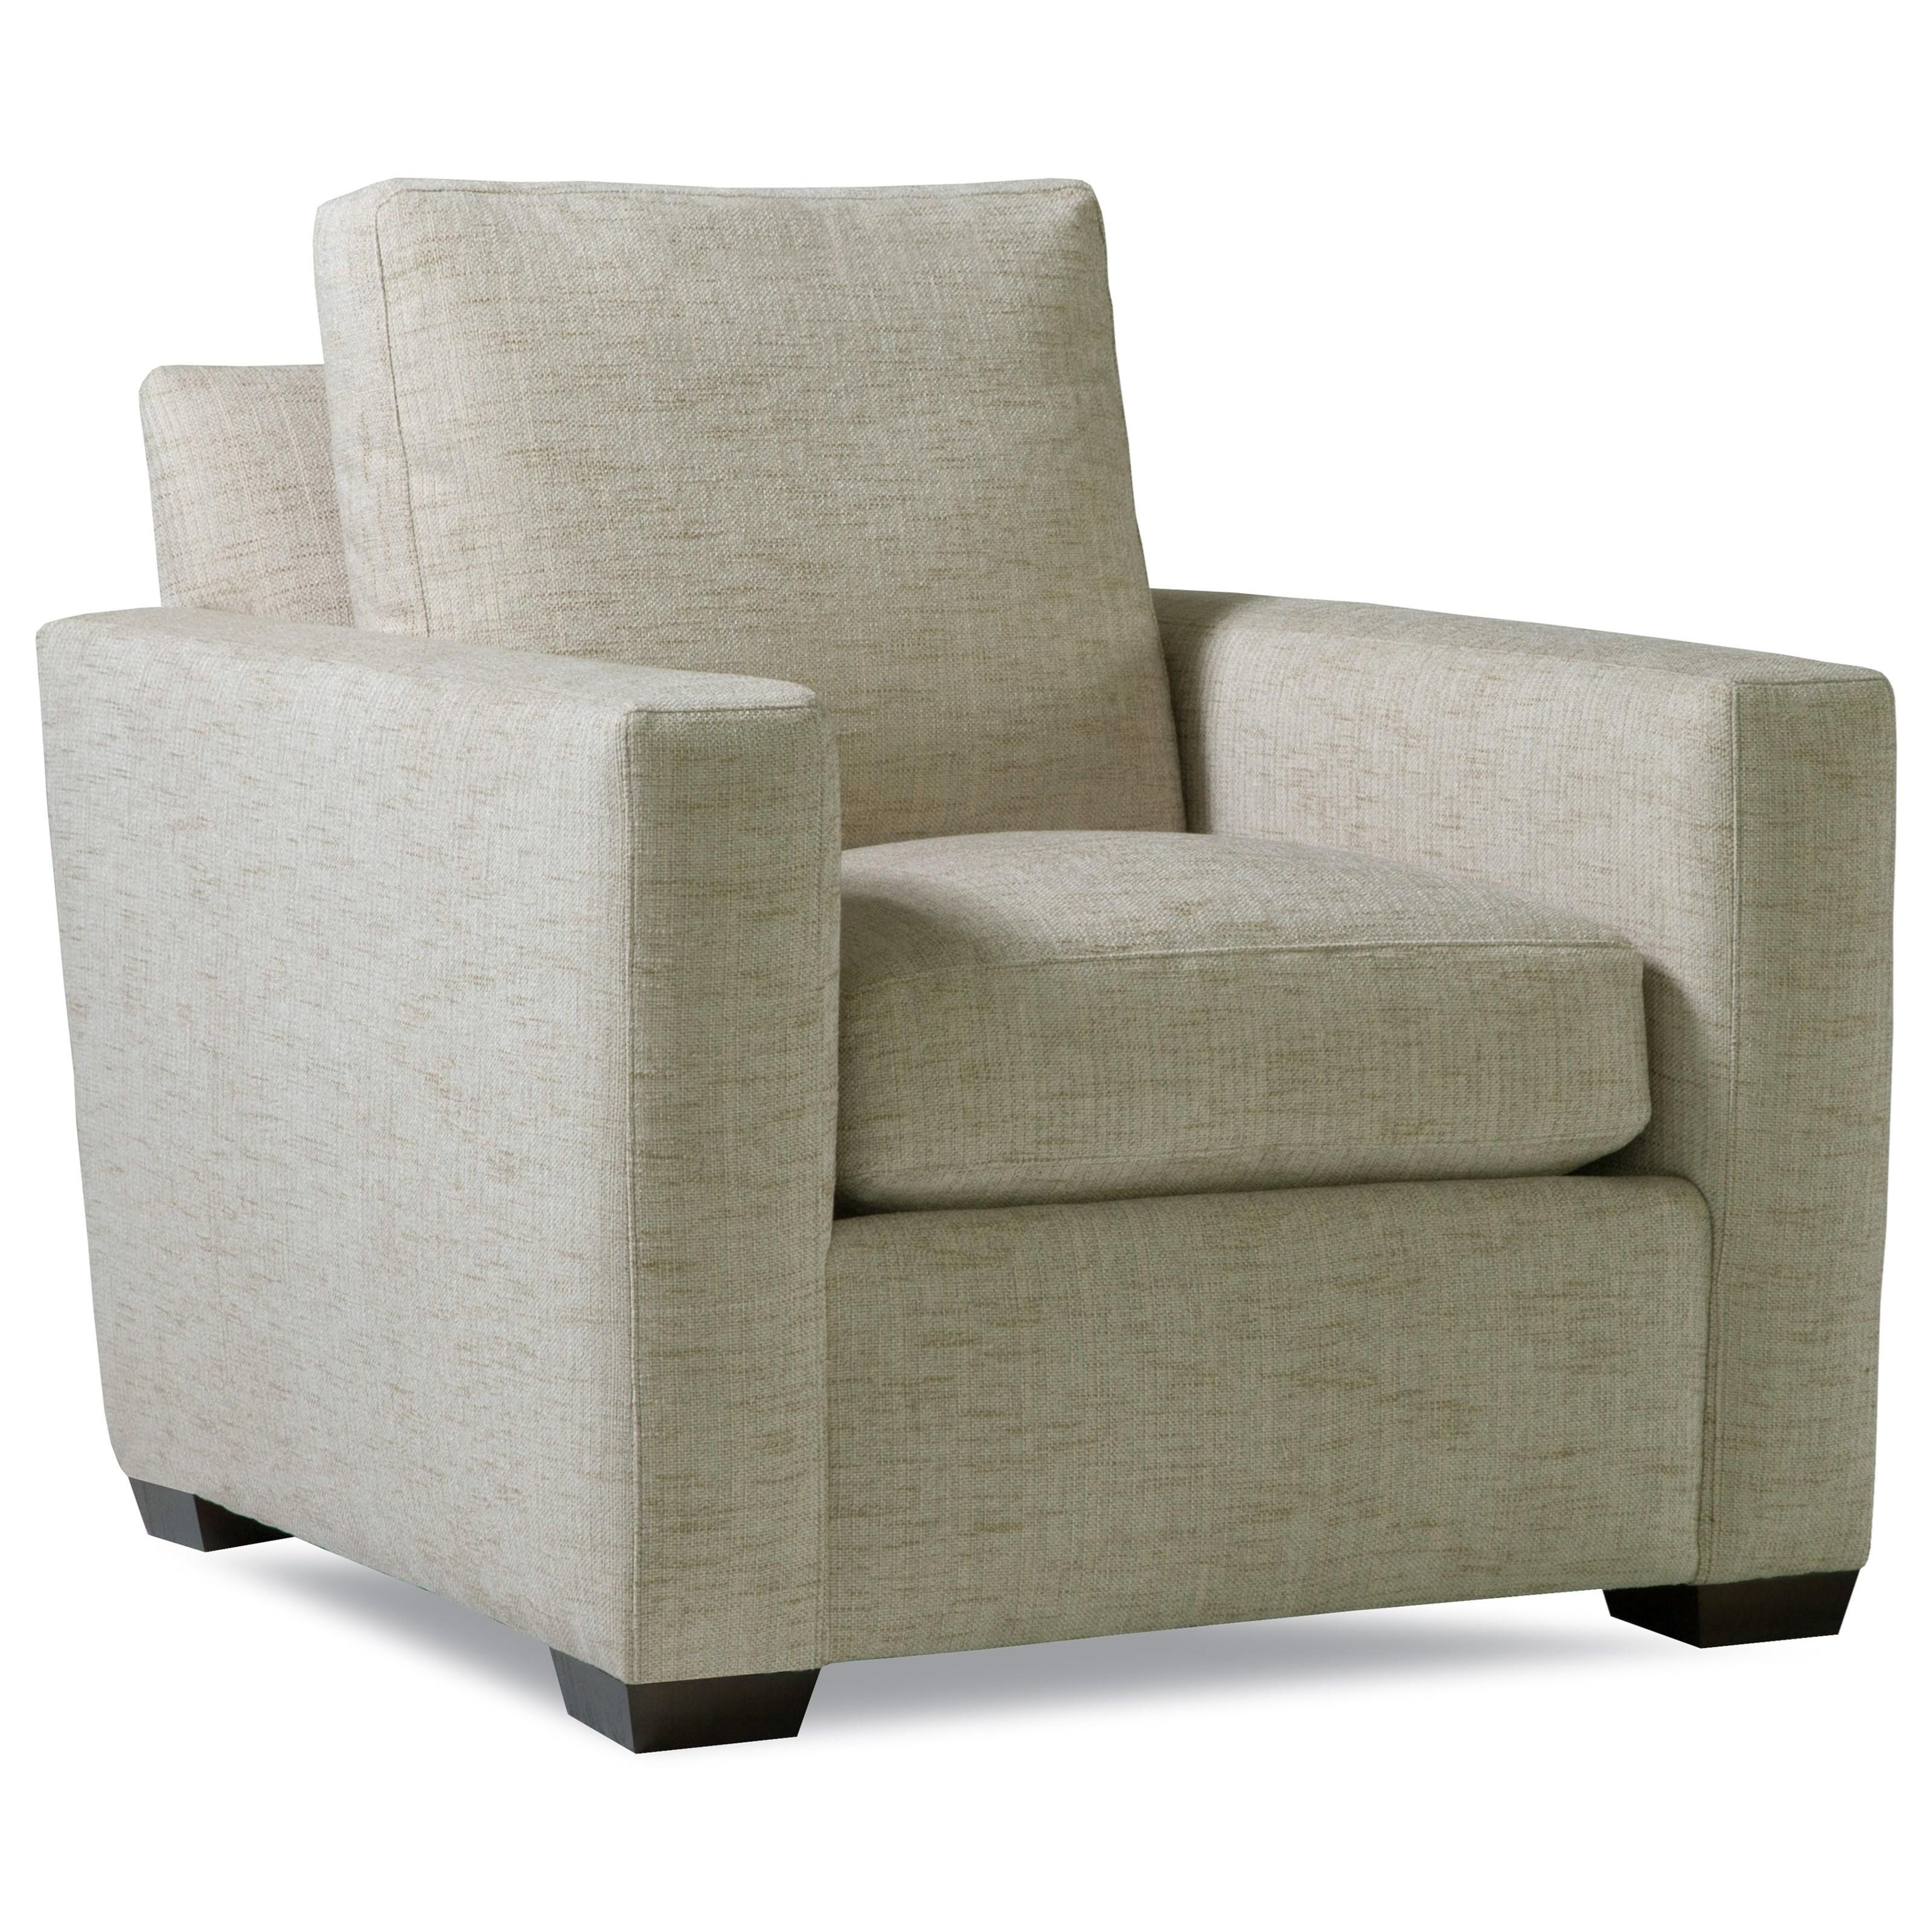 Plush Chair w/ Track Arms by Geoffrey Alexander at Sprintz Furniture